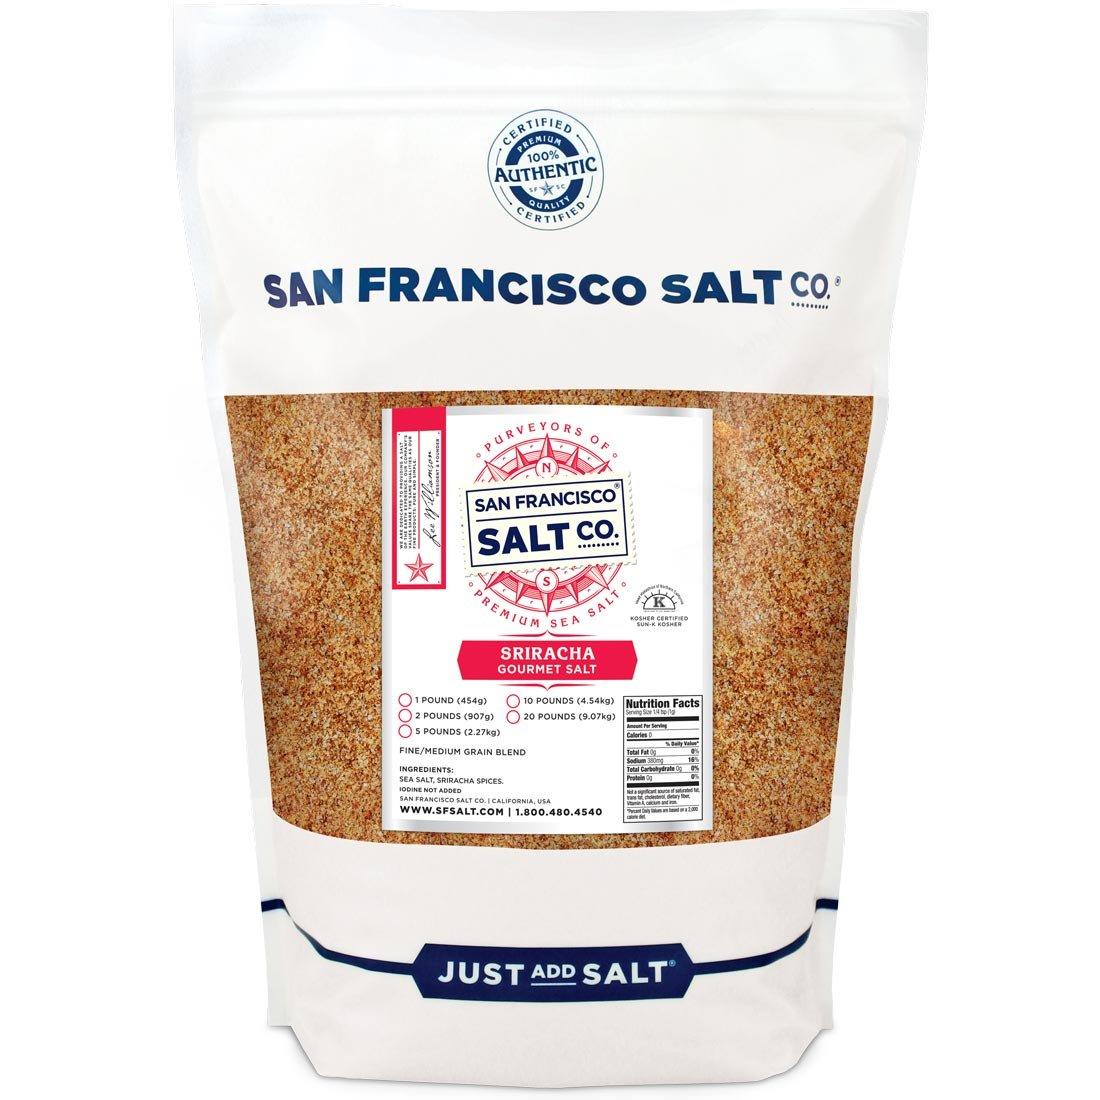 Sriracha Salt 2 lb. Bulk Bag - Fire Up Your Taste Buds, Spicy Sea Salt Blend with Hot Chimayo Pepper, Habanero Pepper & Garlic Powder